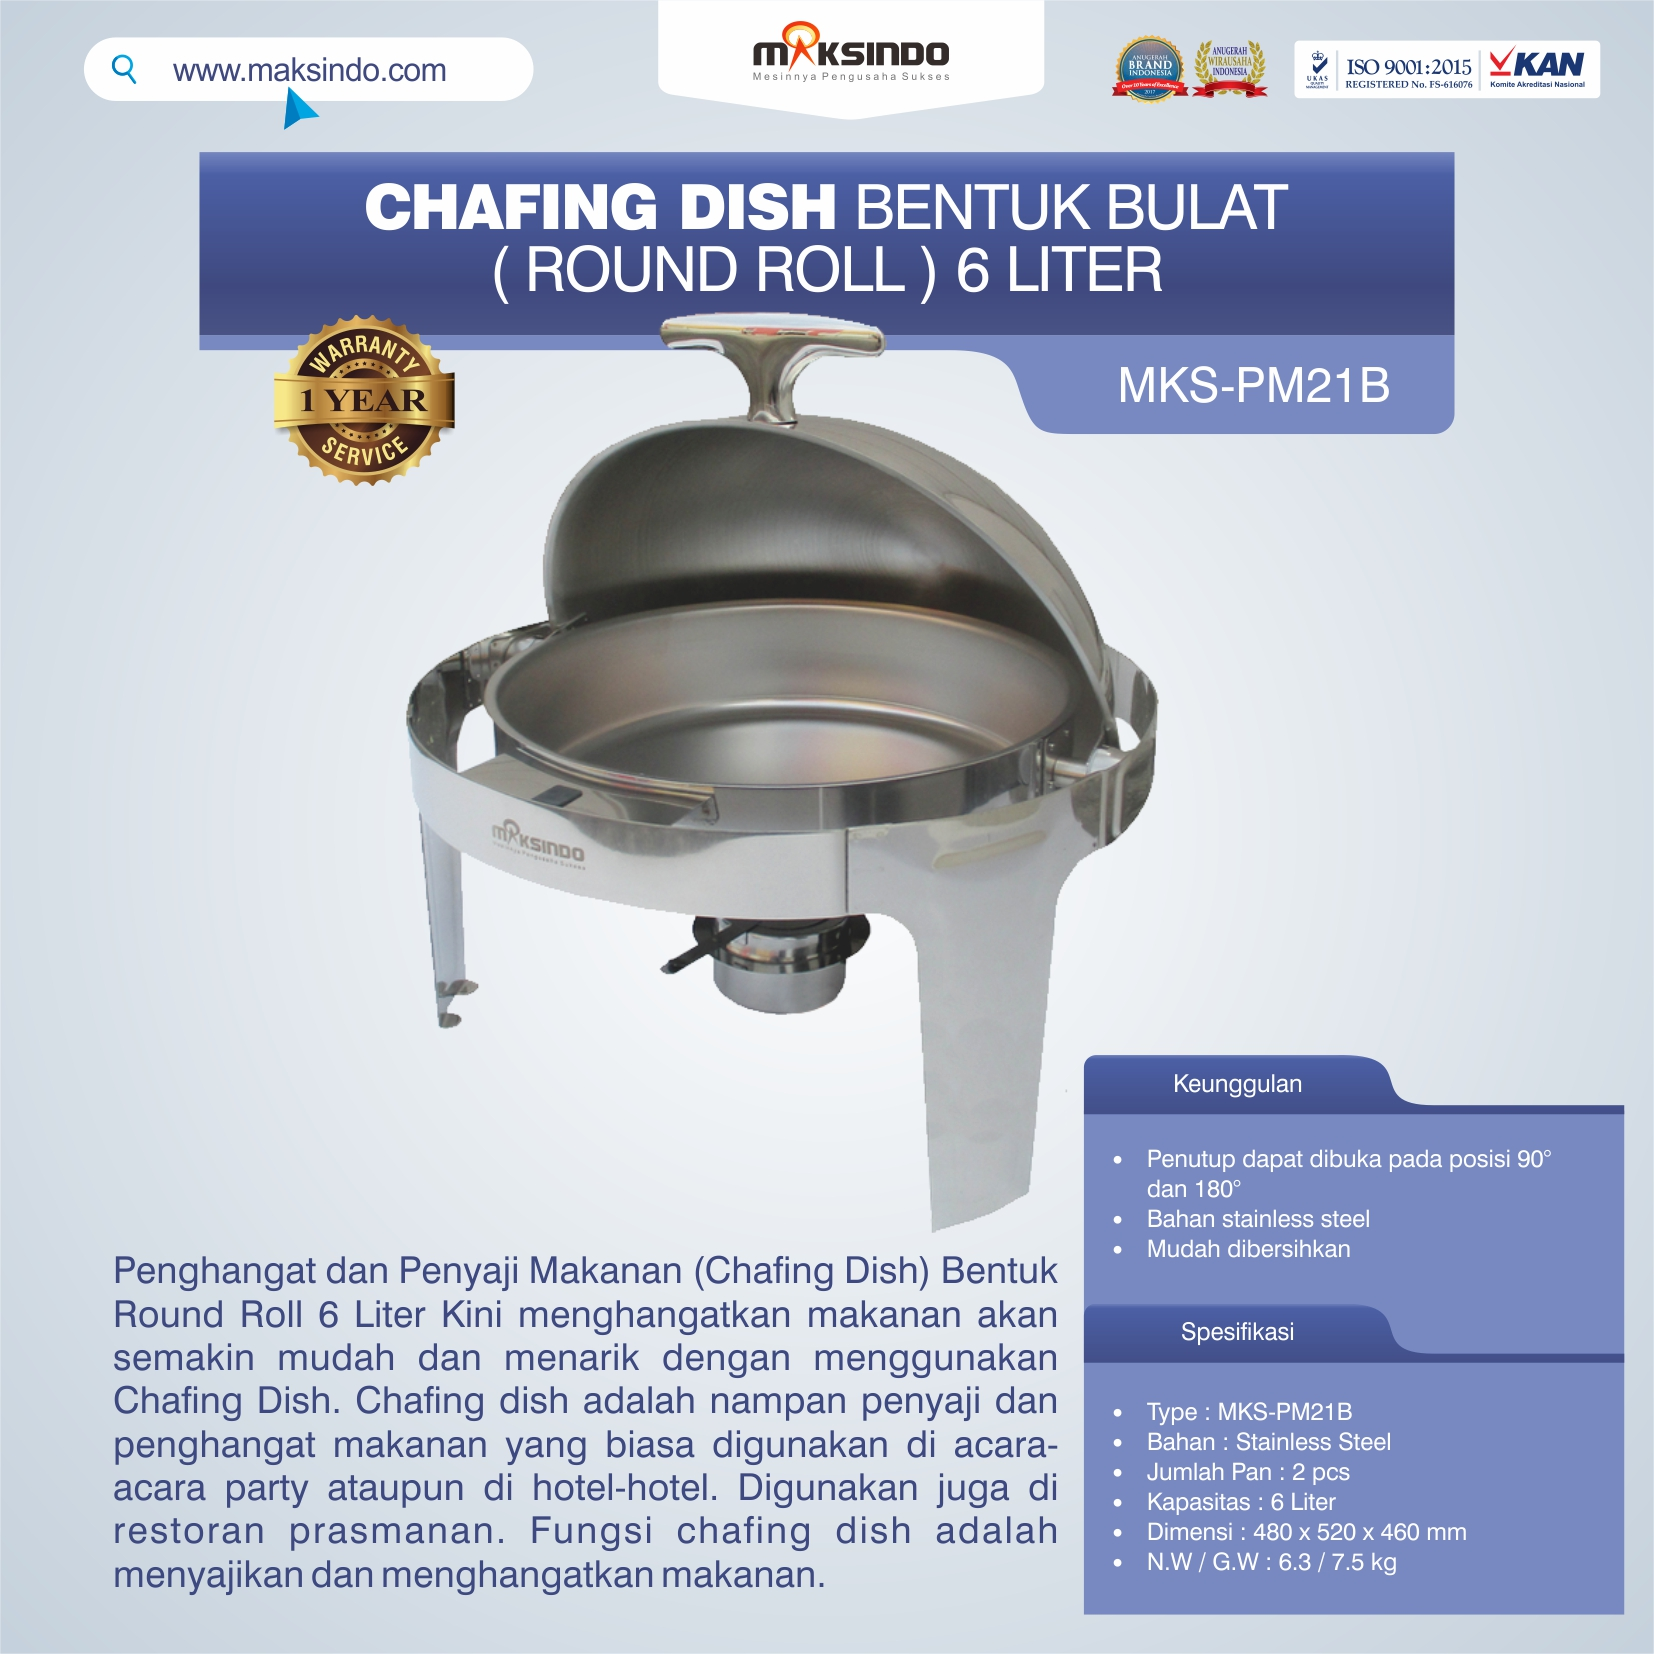 Jual Chafing Dish Bentuk Bulat (Round Roll) 6 Liter di Bandung